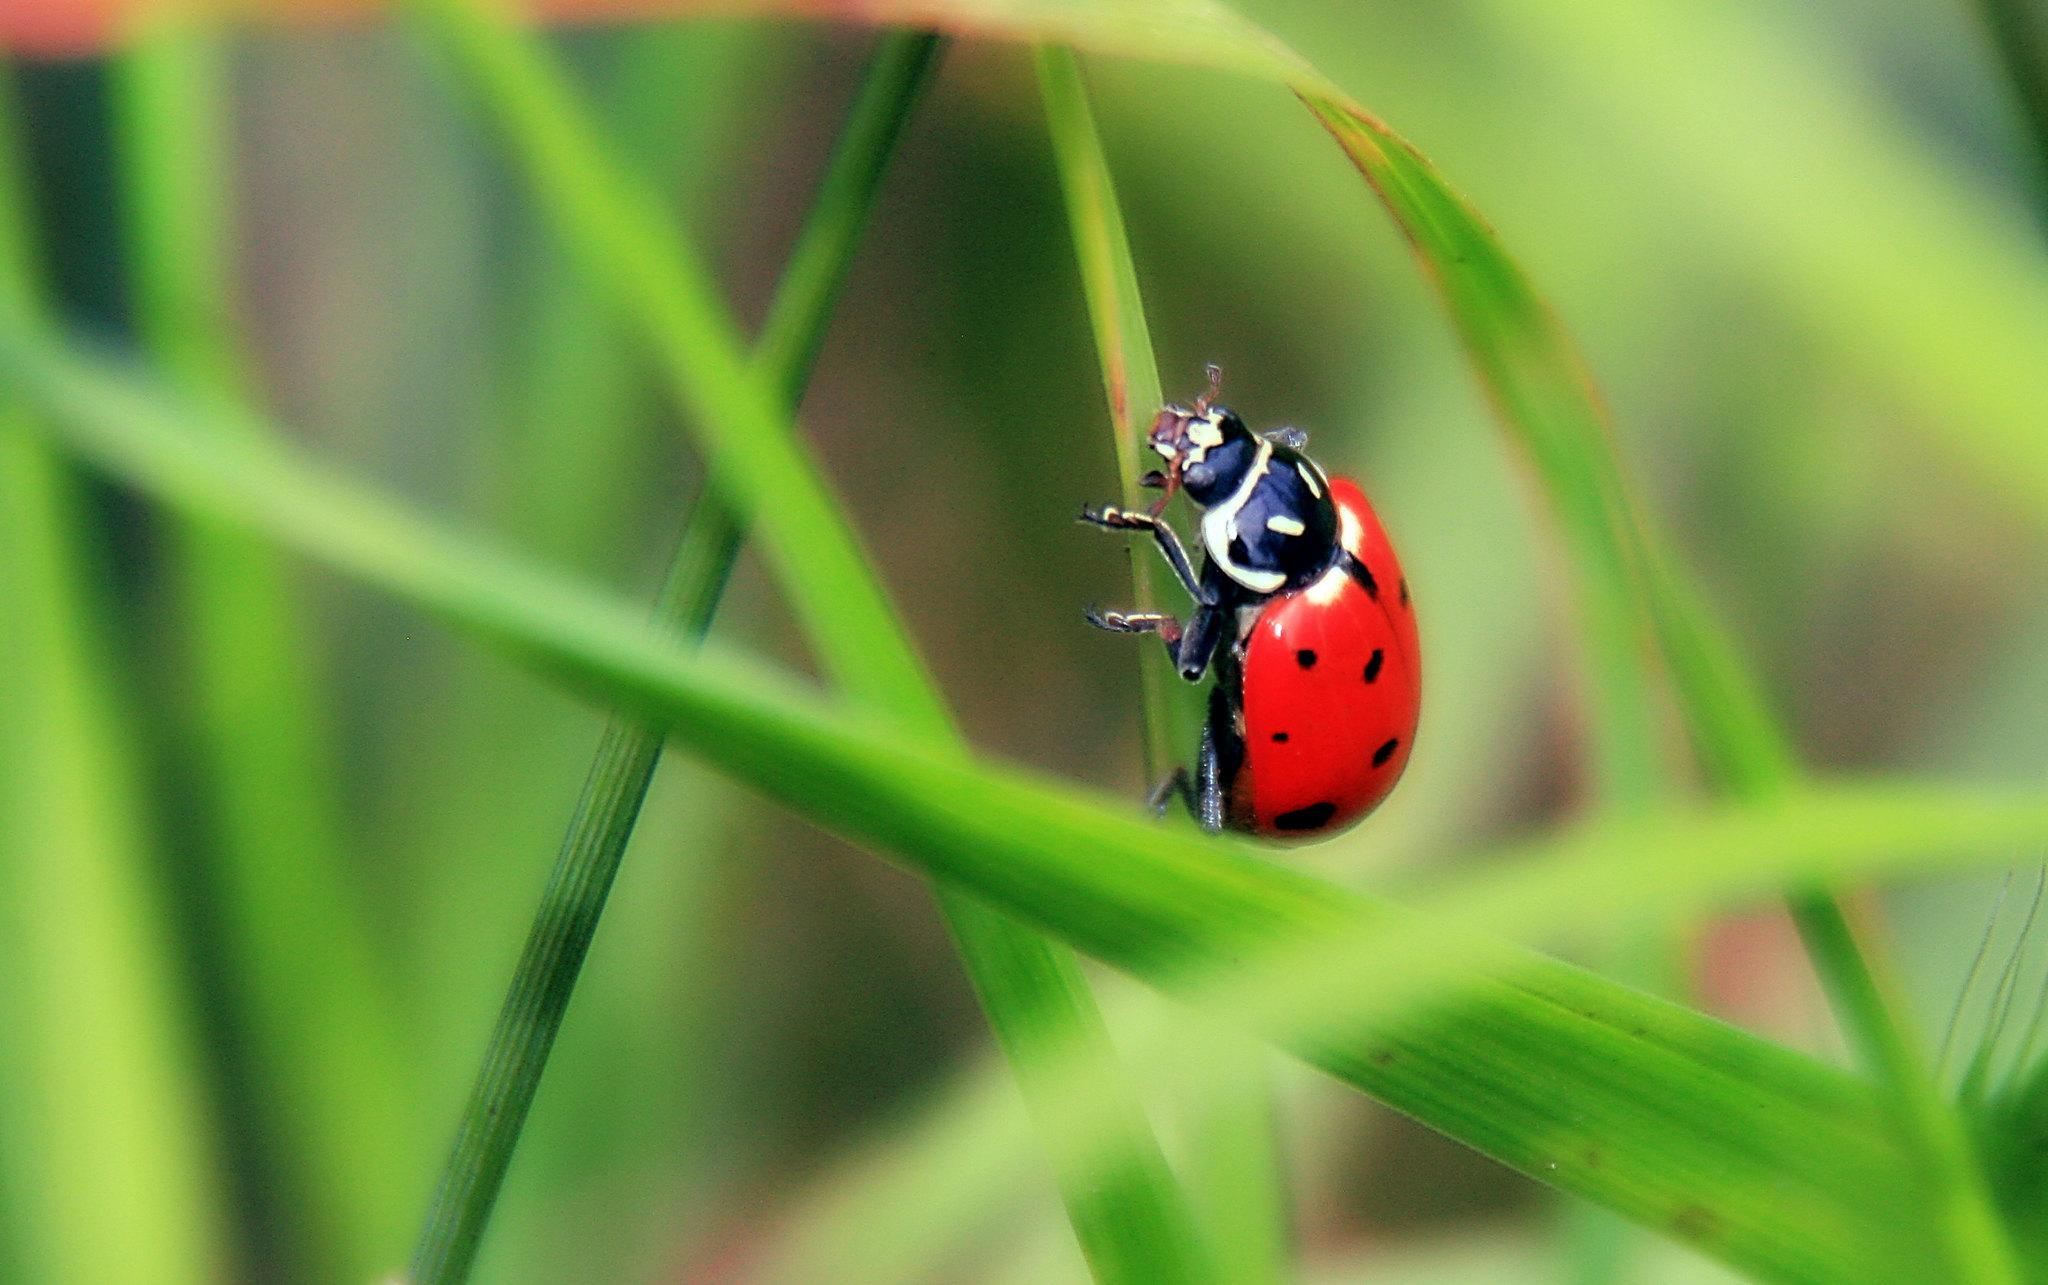 Convergent ladybug